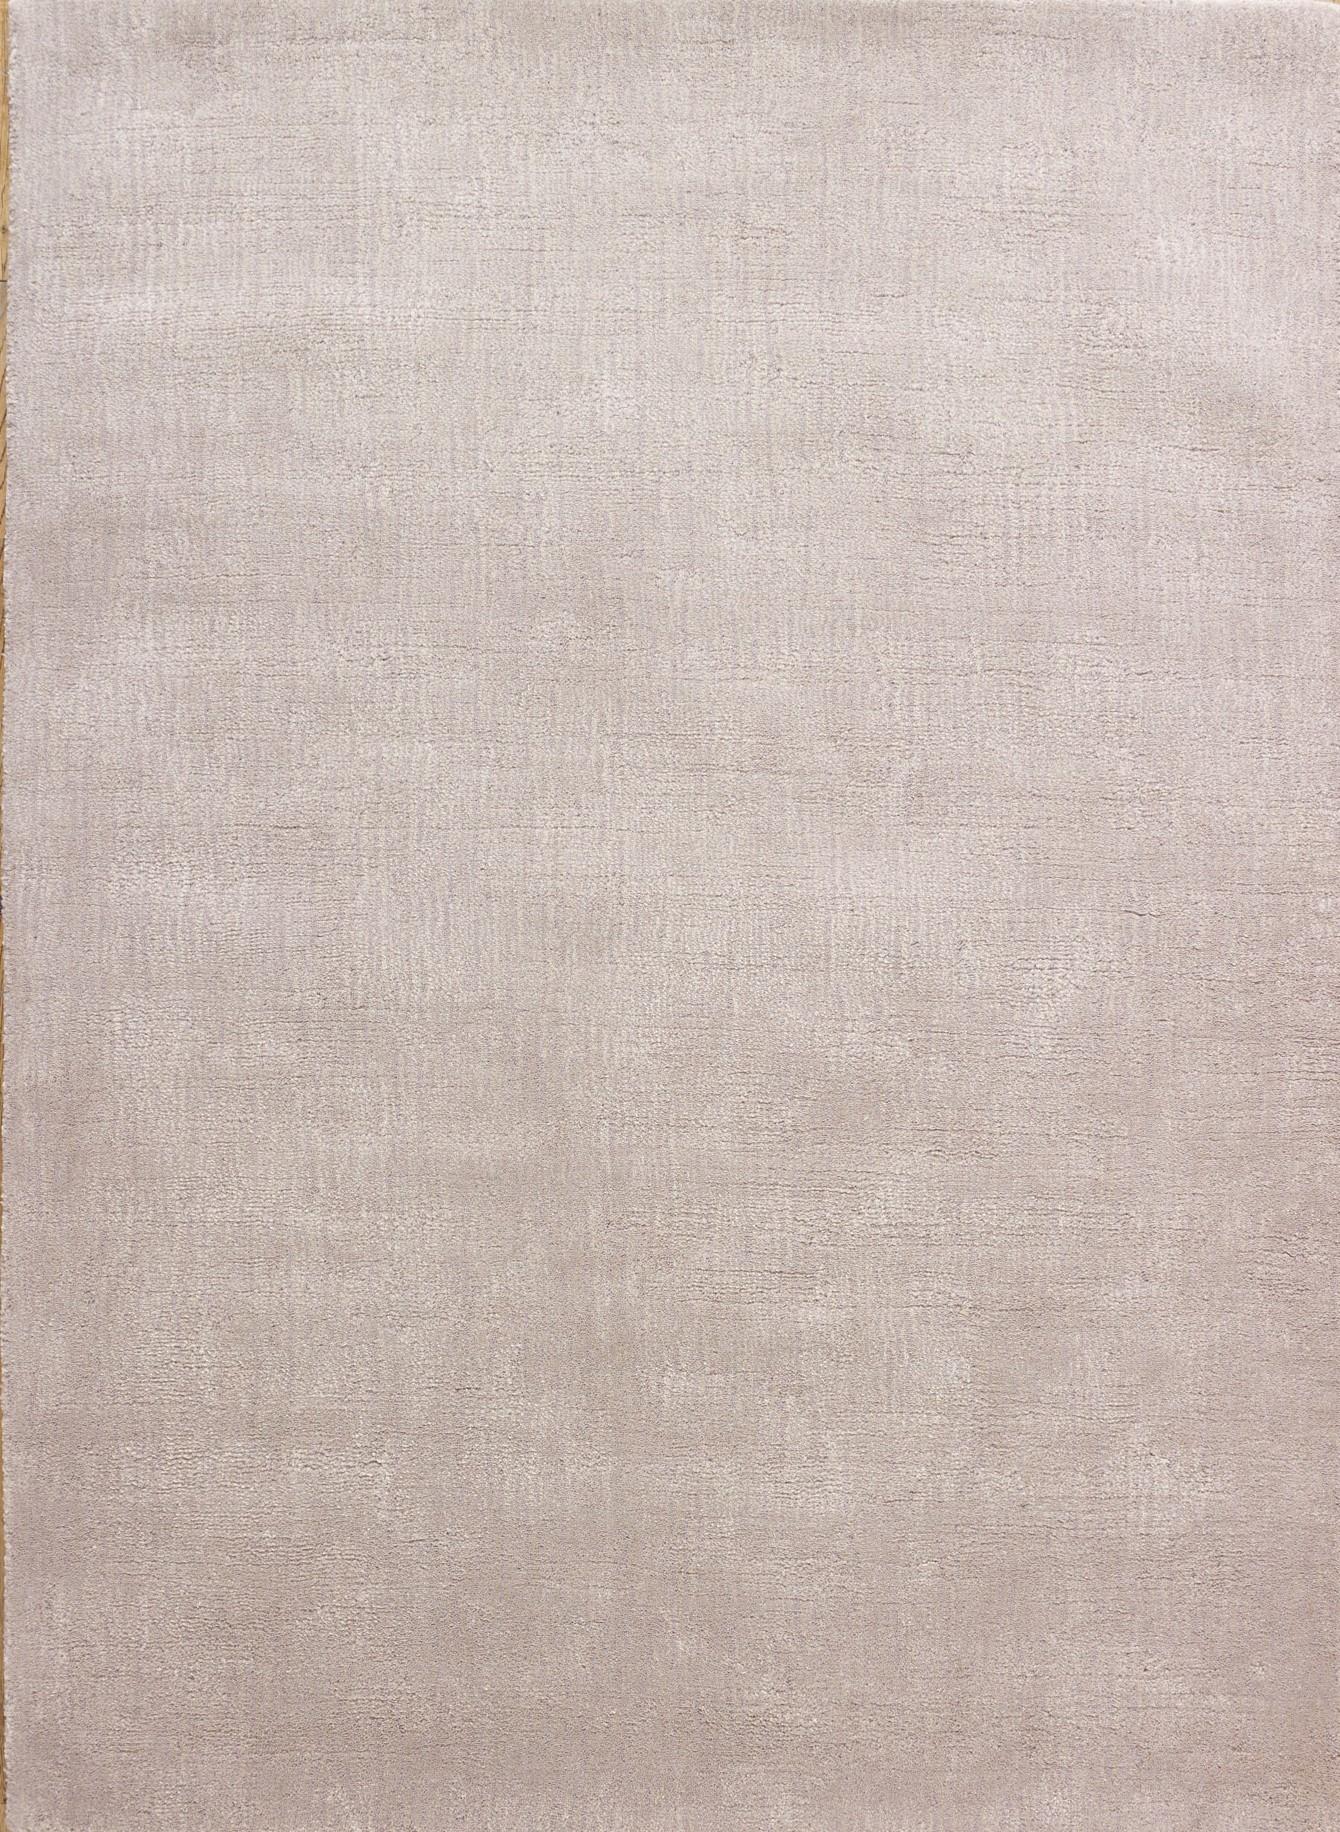 Speckle Handloom Wool Rug (Colour: Ash, Rug Size: 160 x 220)